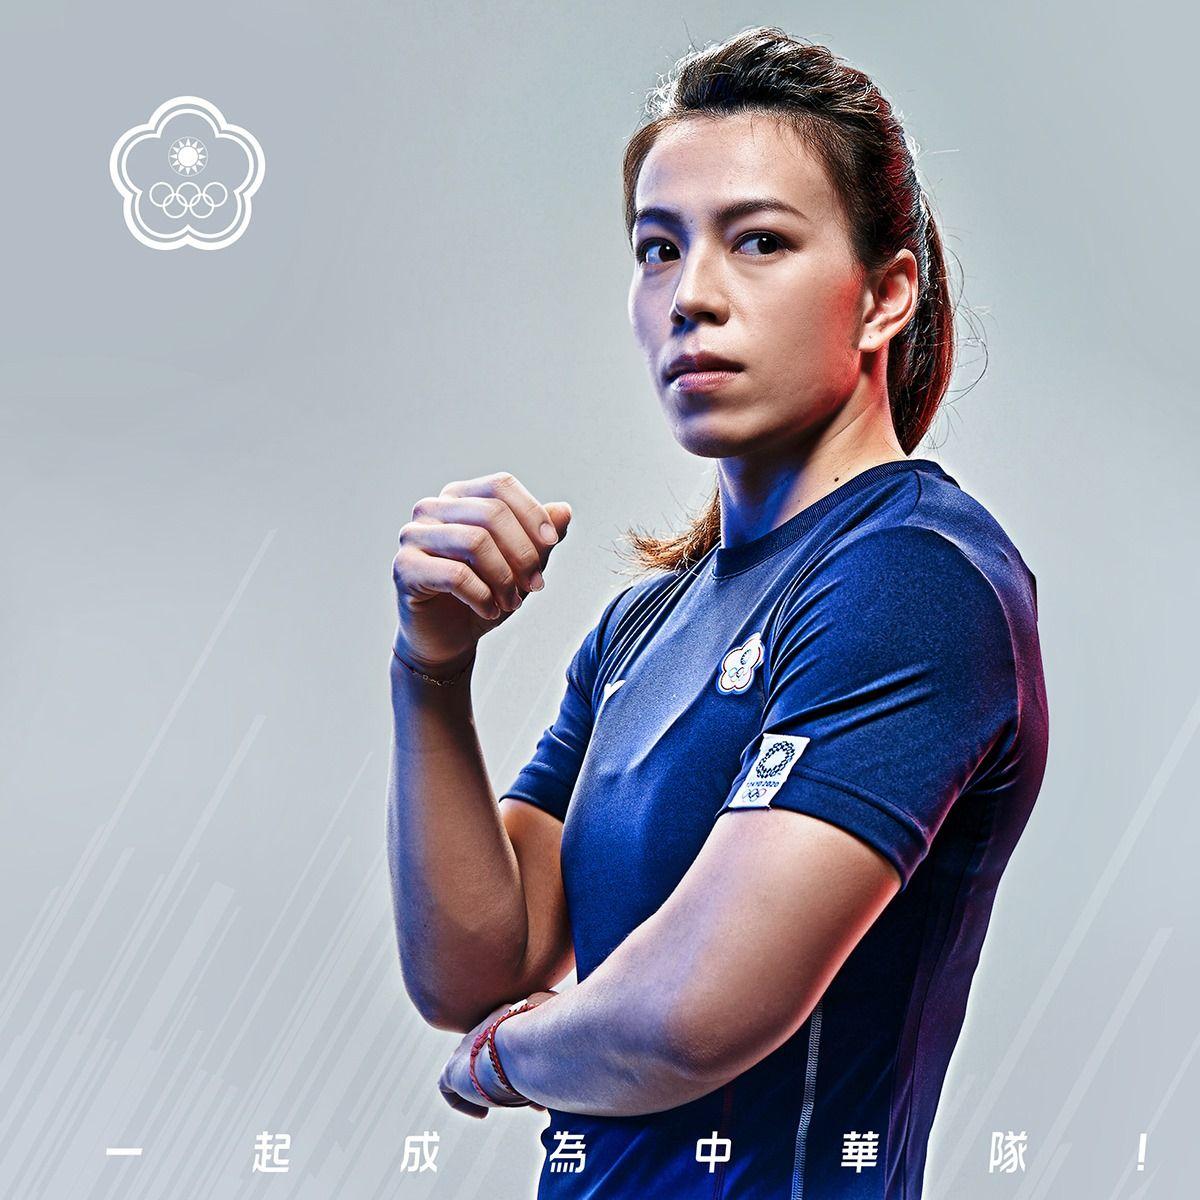 郭婞淳。(圖片來源/中華奧會 Chinese Taipei Olympic Committee@Facebook)